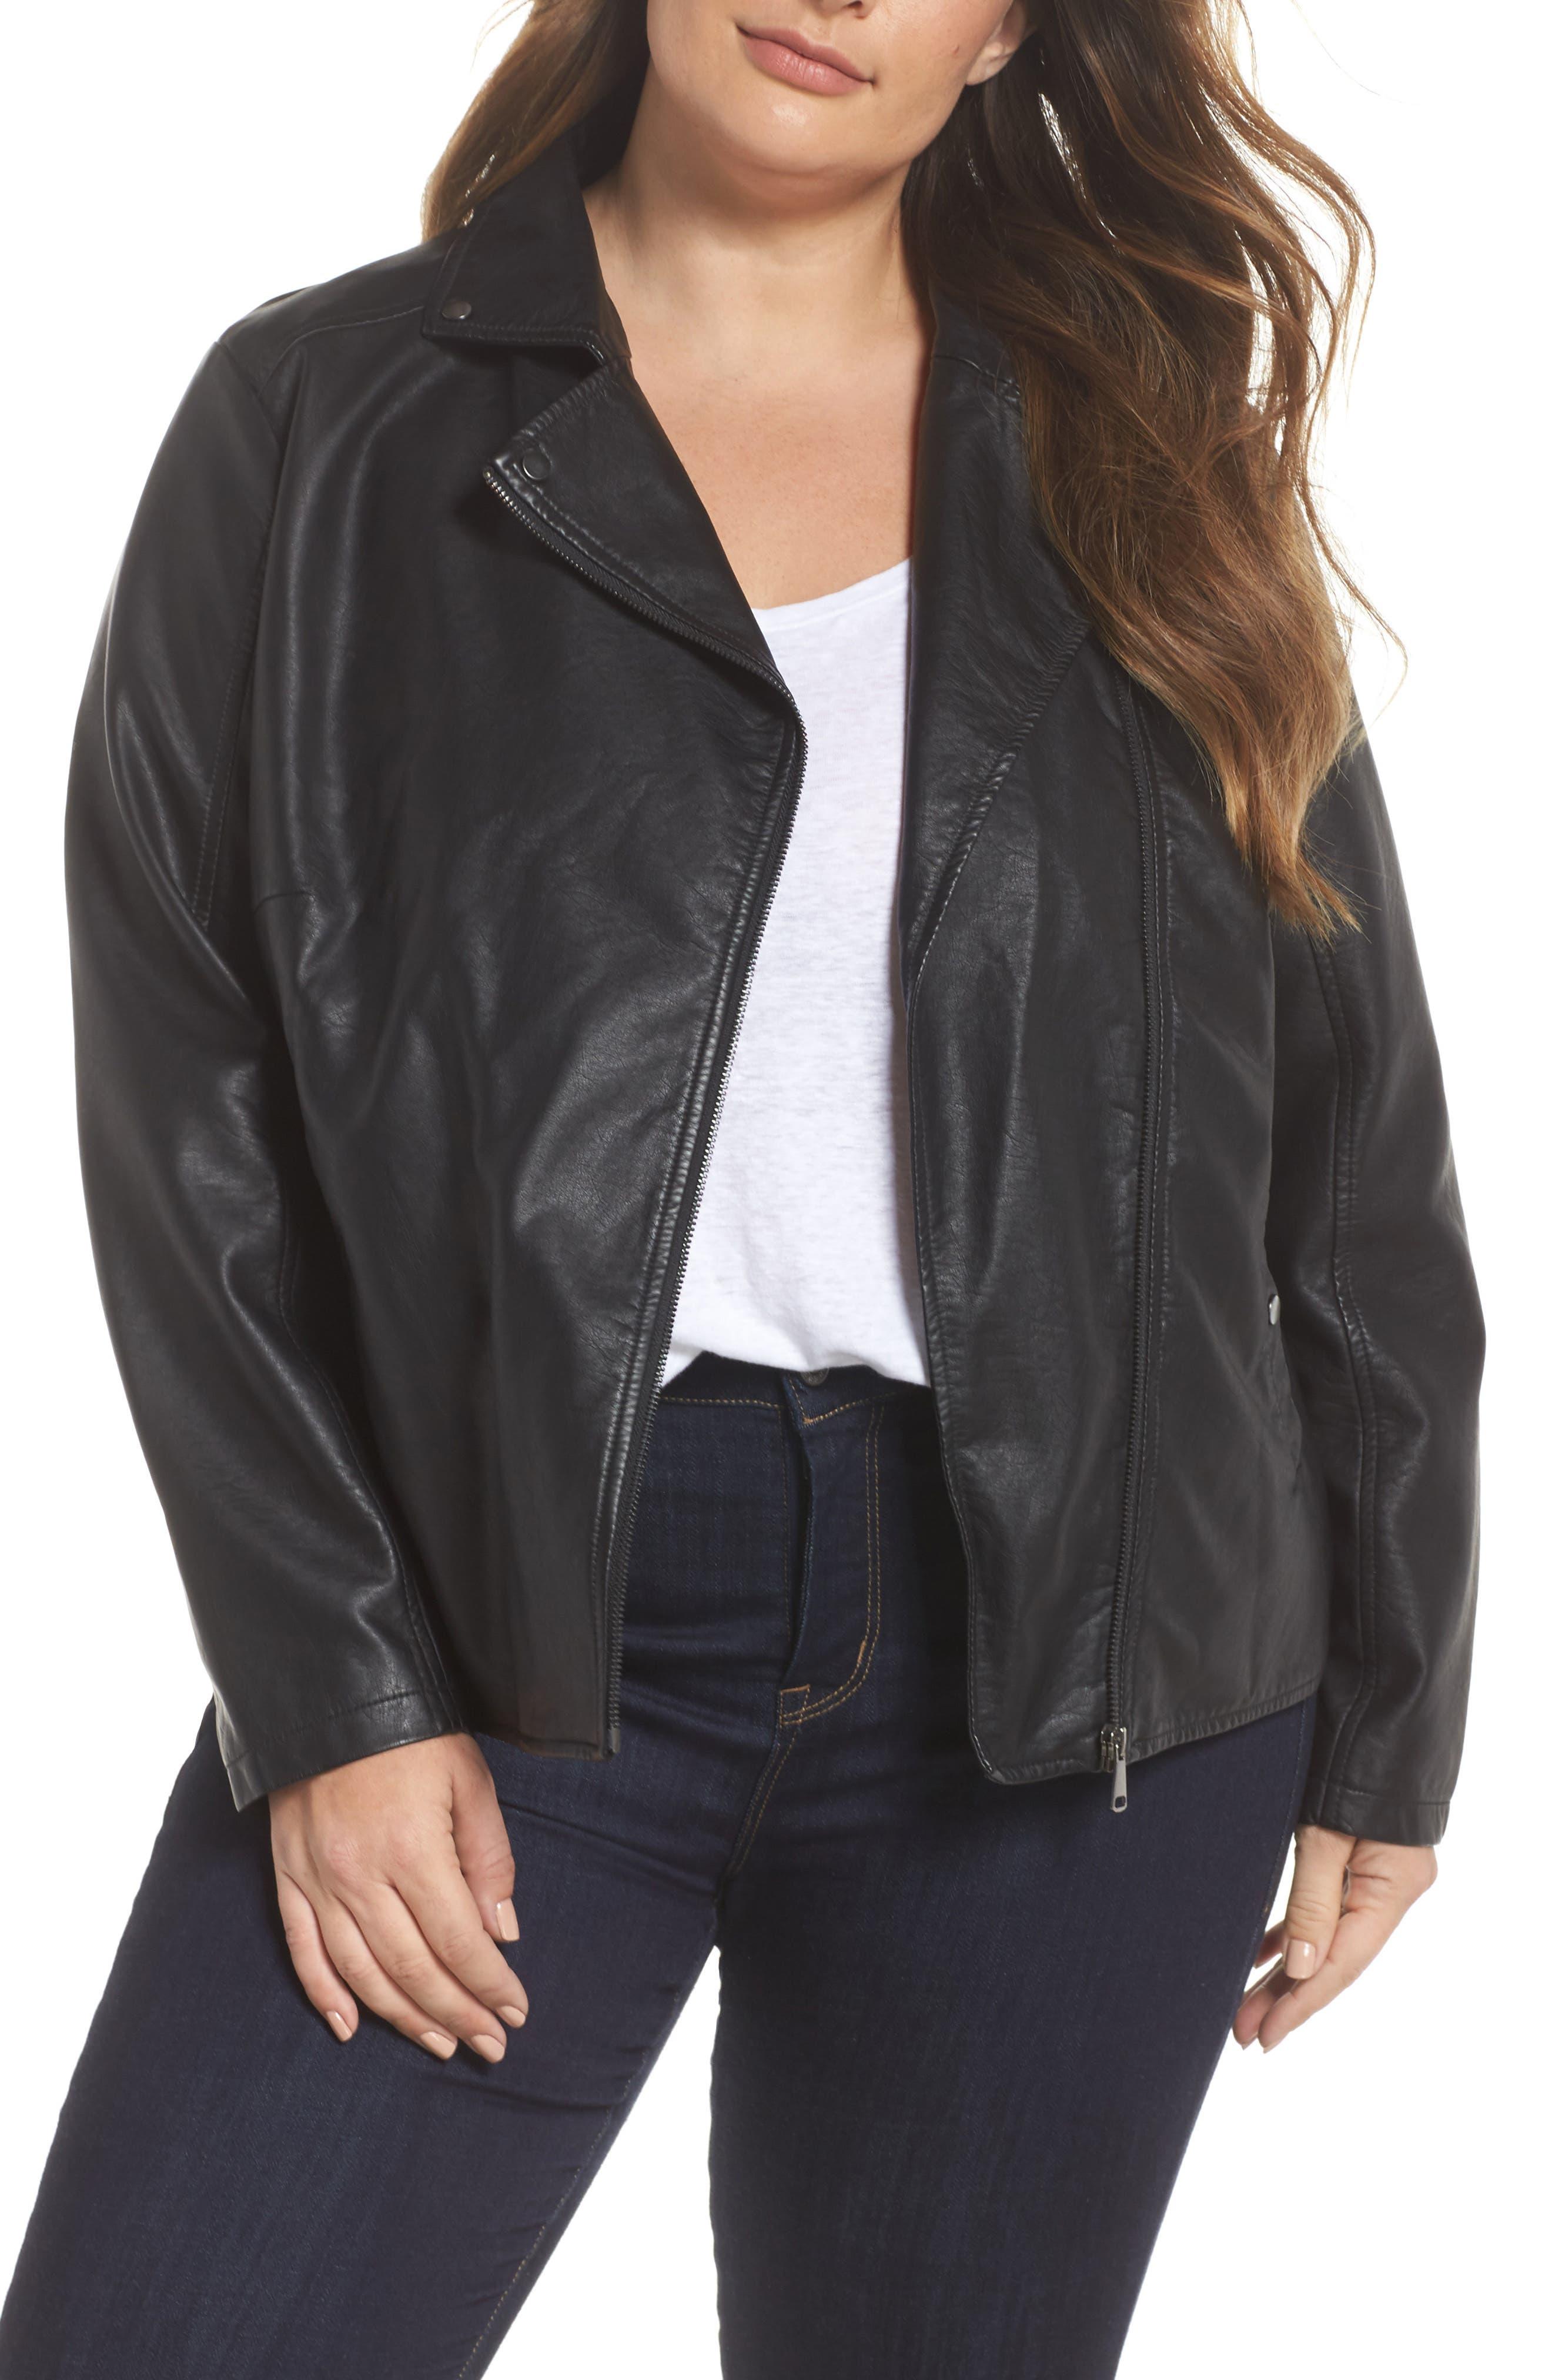 Karisa Faux Leather Moto Jacket,                             Main thumbnail 1, color,                             002